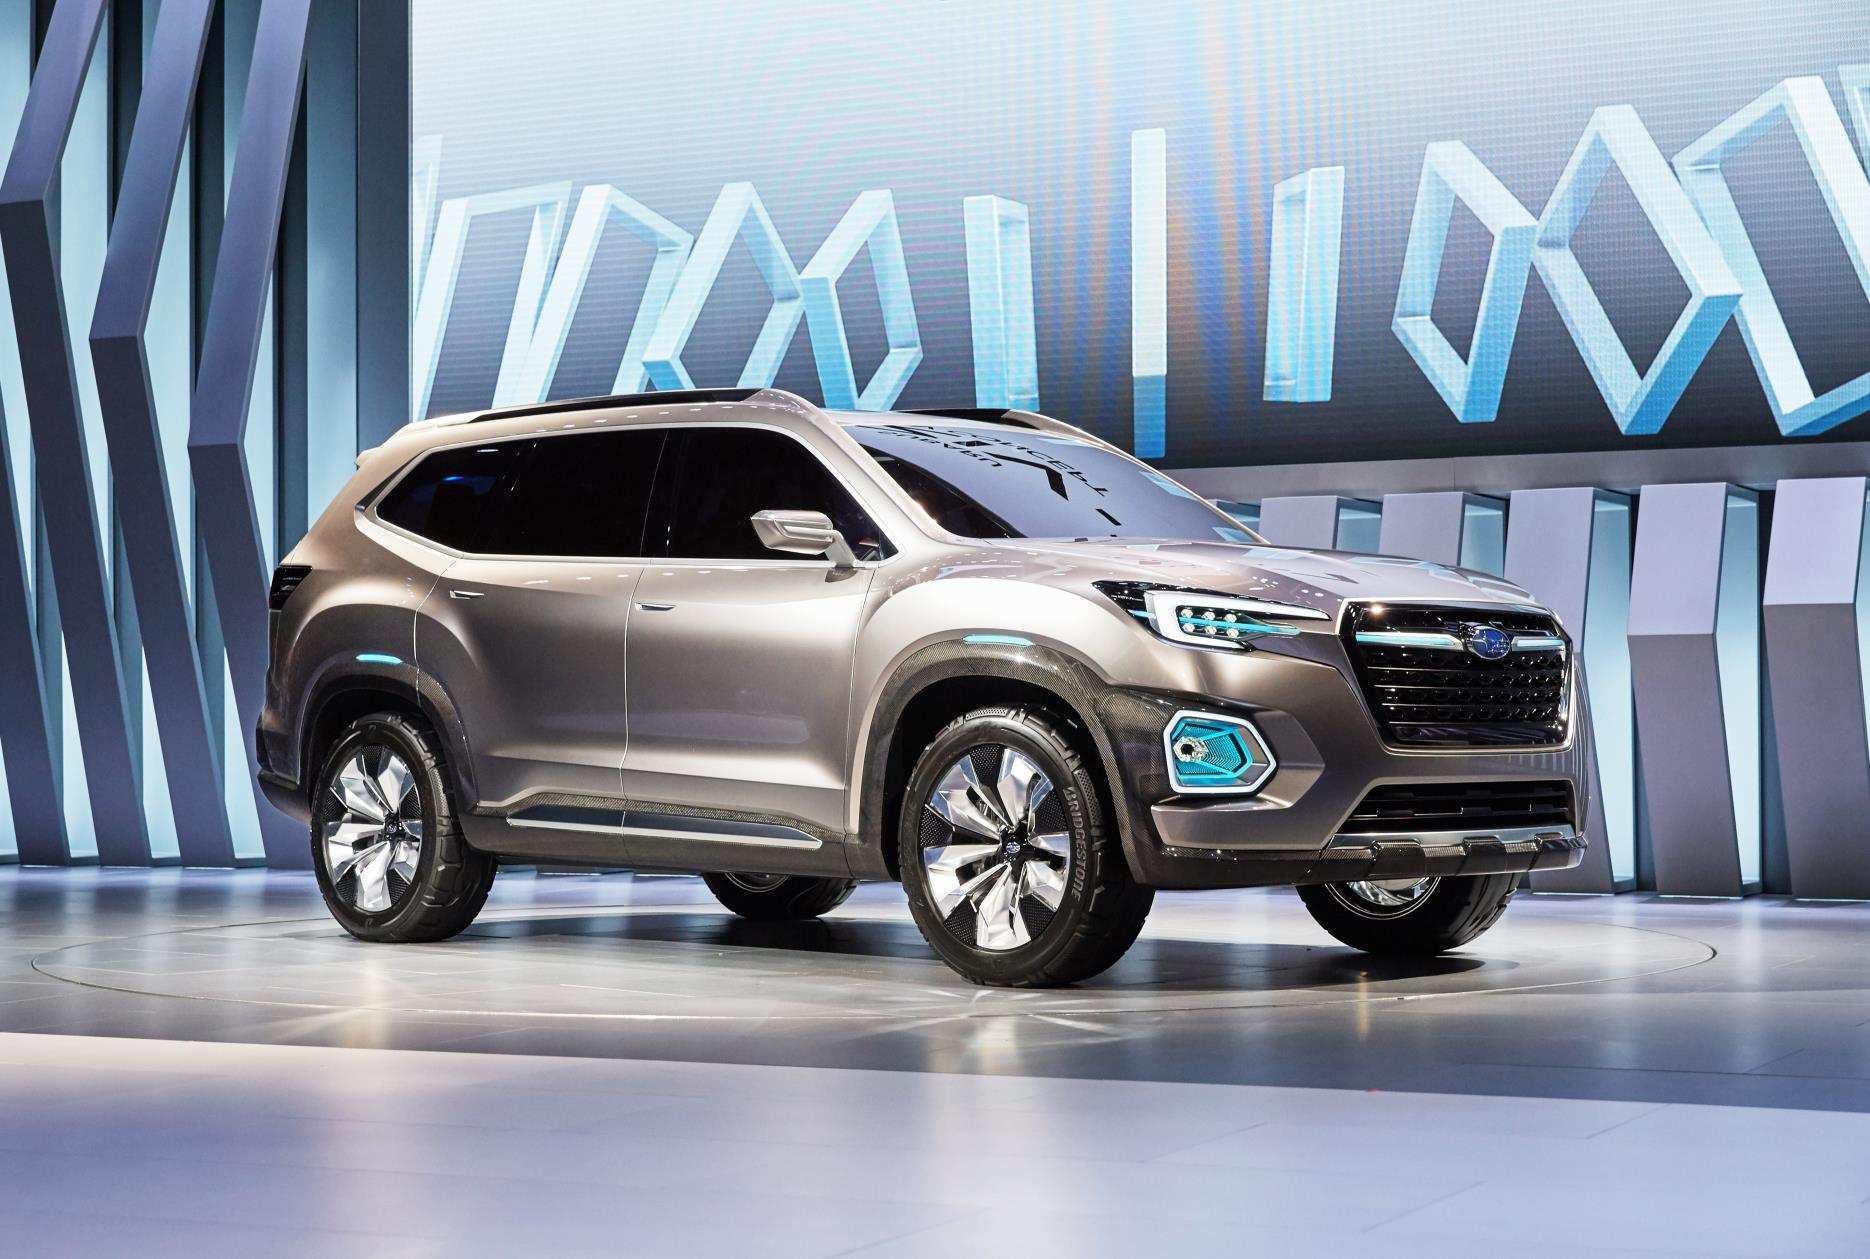 44 New Subaru Tribeca Concept Pictures for Subaru Tribeca Concept